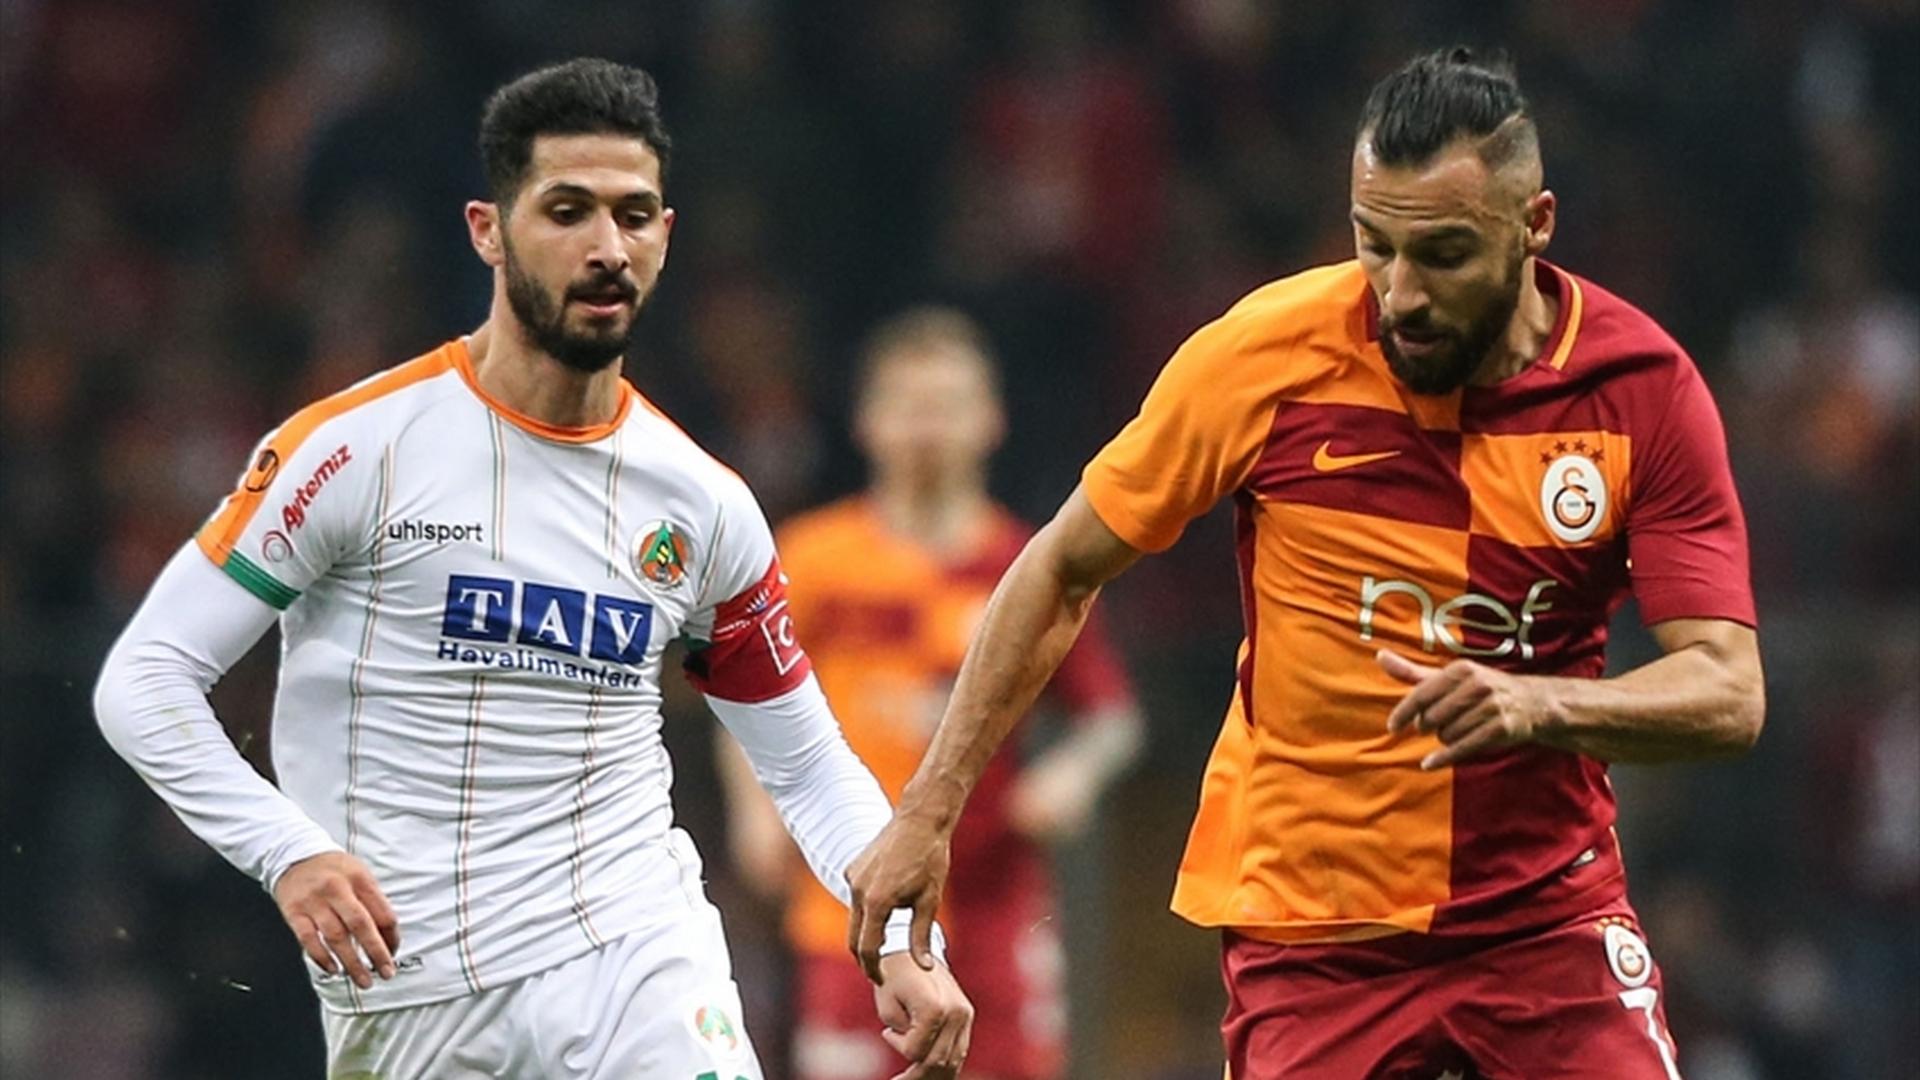 Emre Akbaba Yasin Oztekin Galatasaray Alanyaspor 25112017